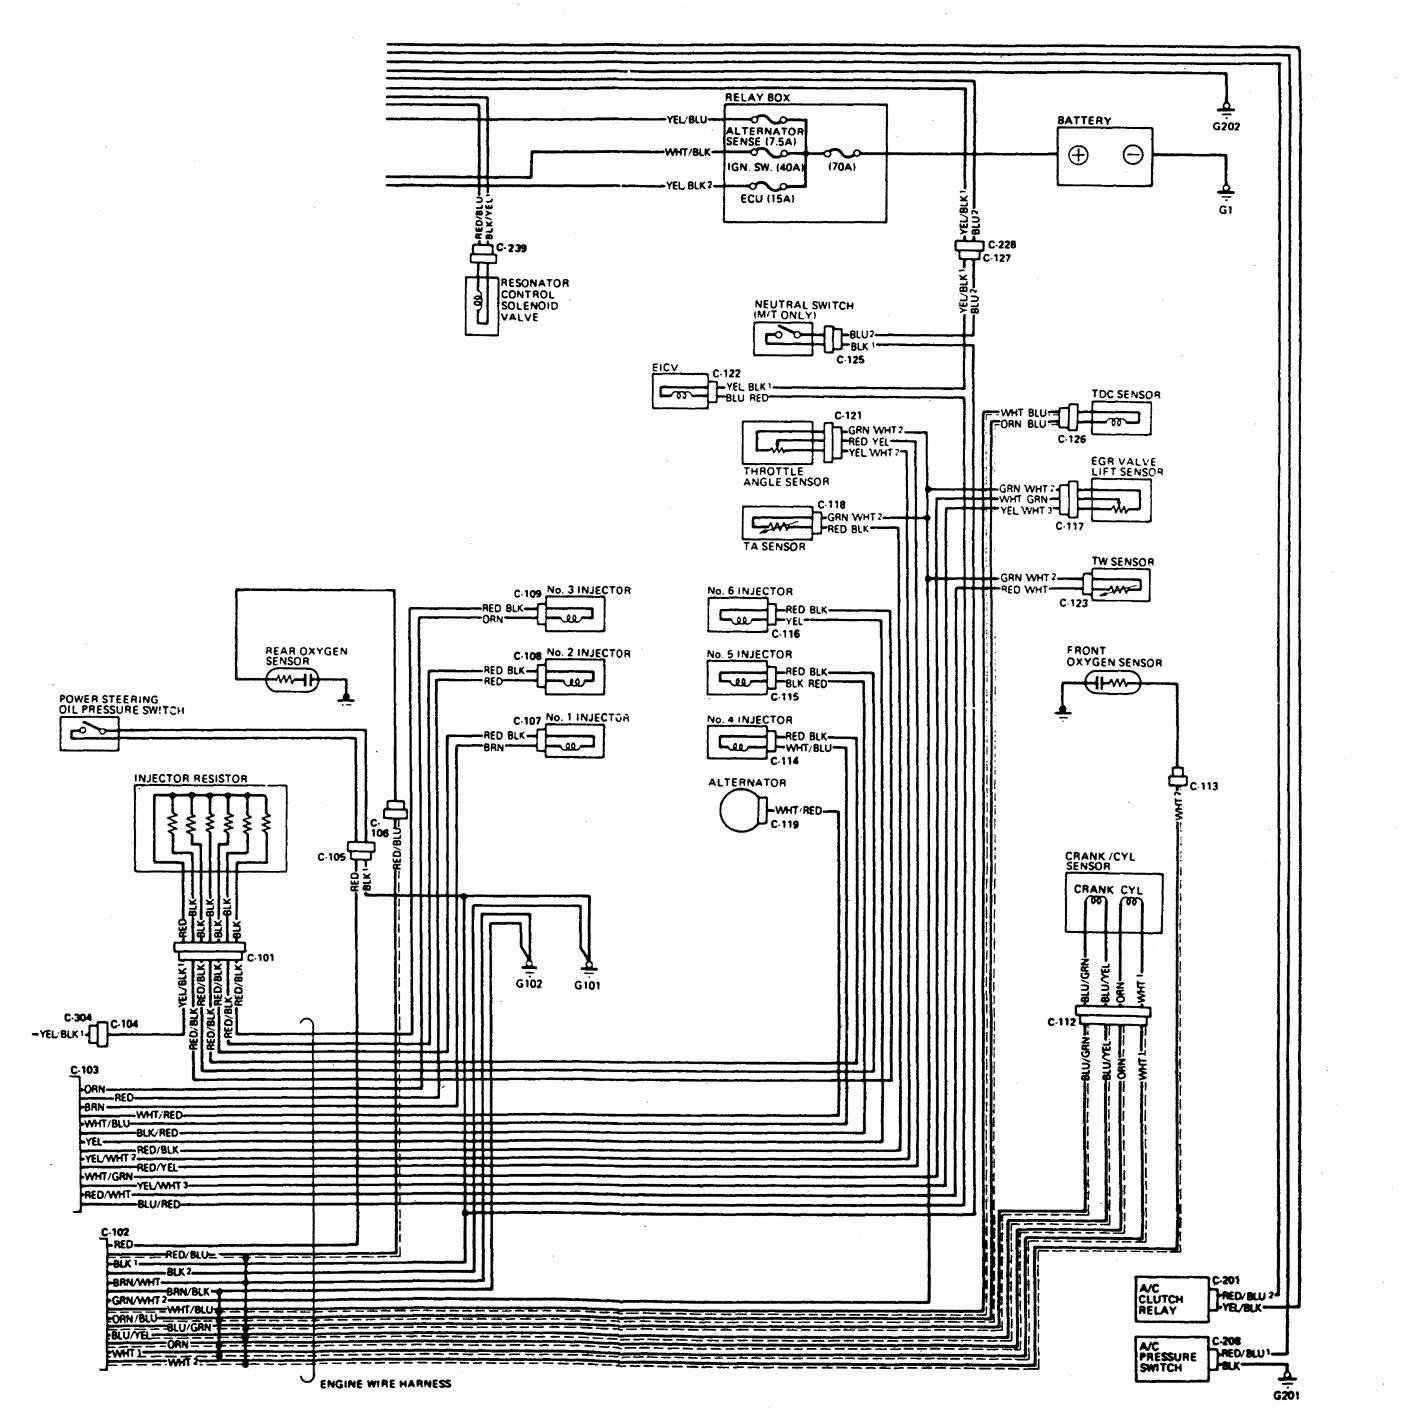 acura legend stereo wiring diagram acura auto wiring diagram